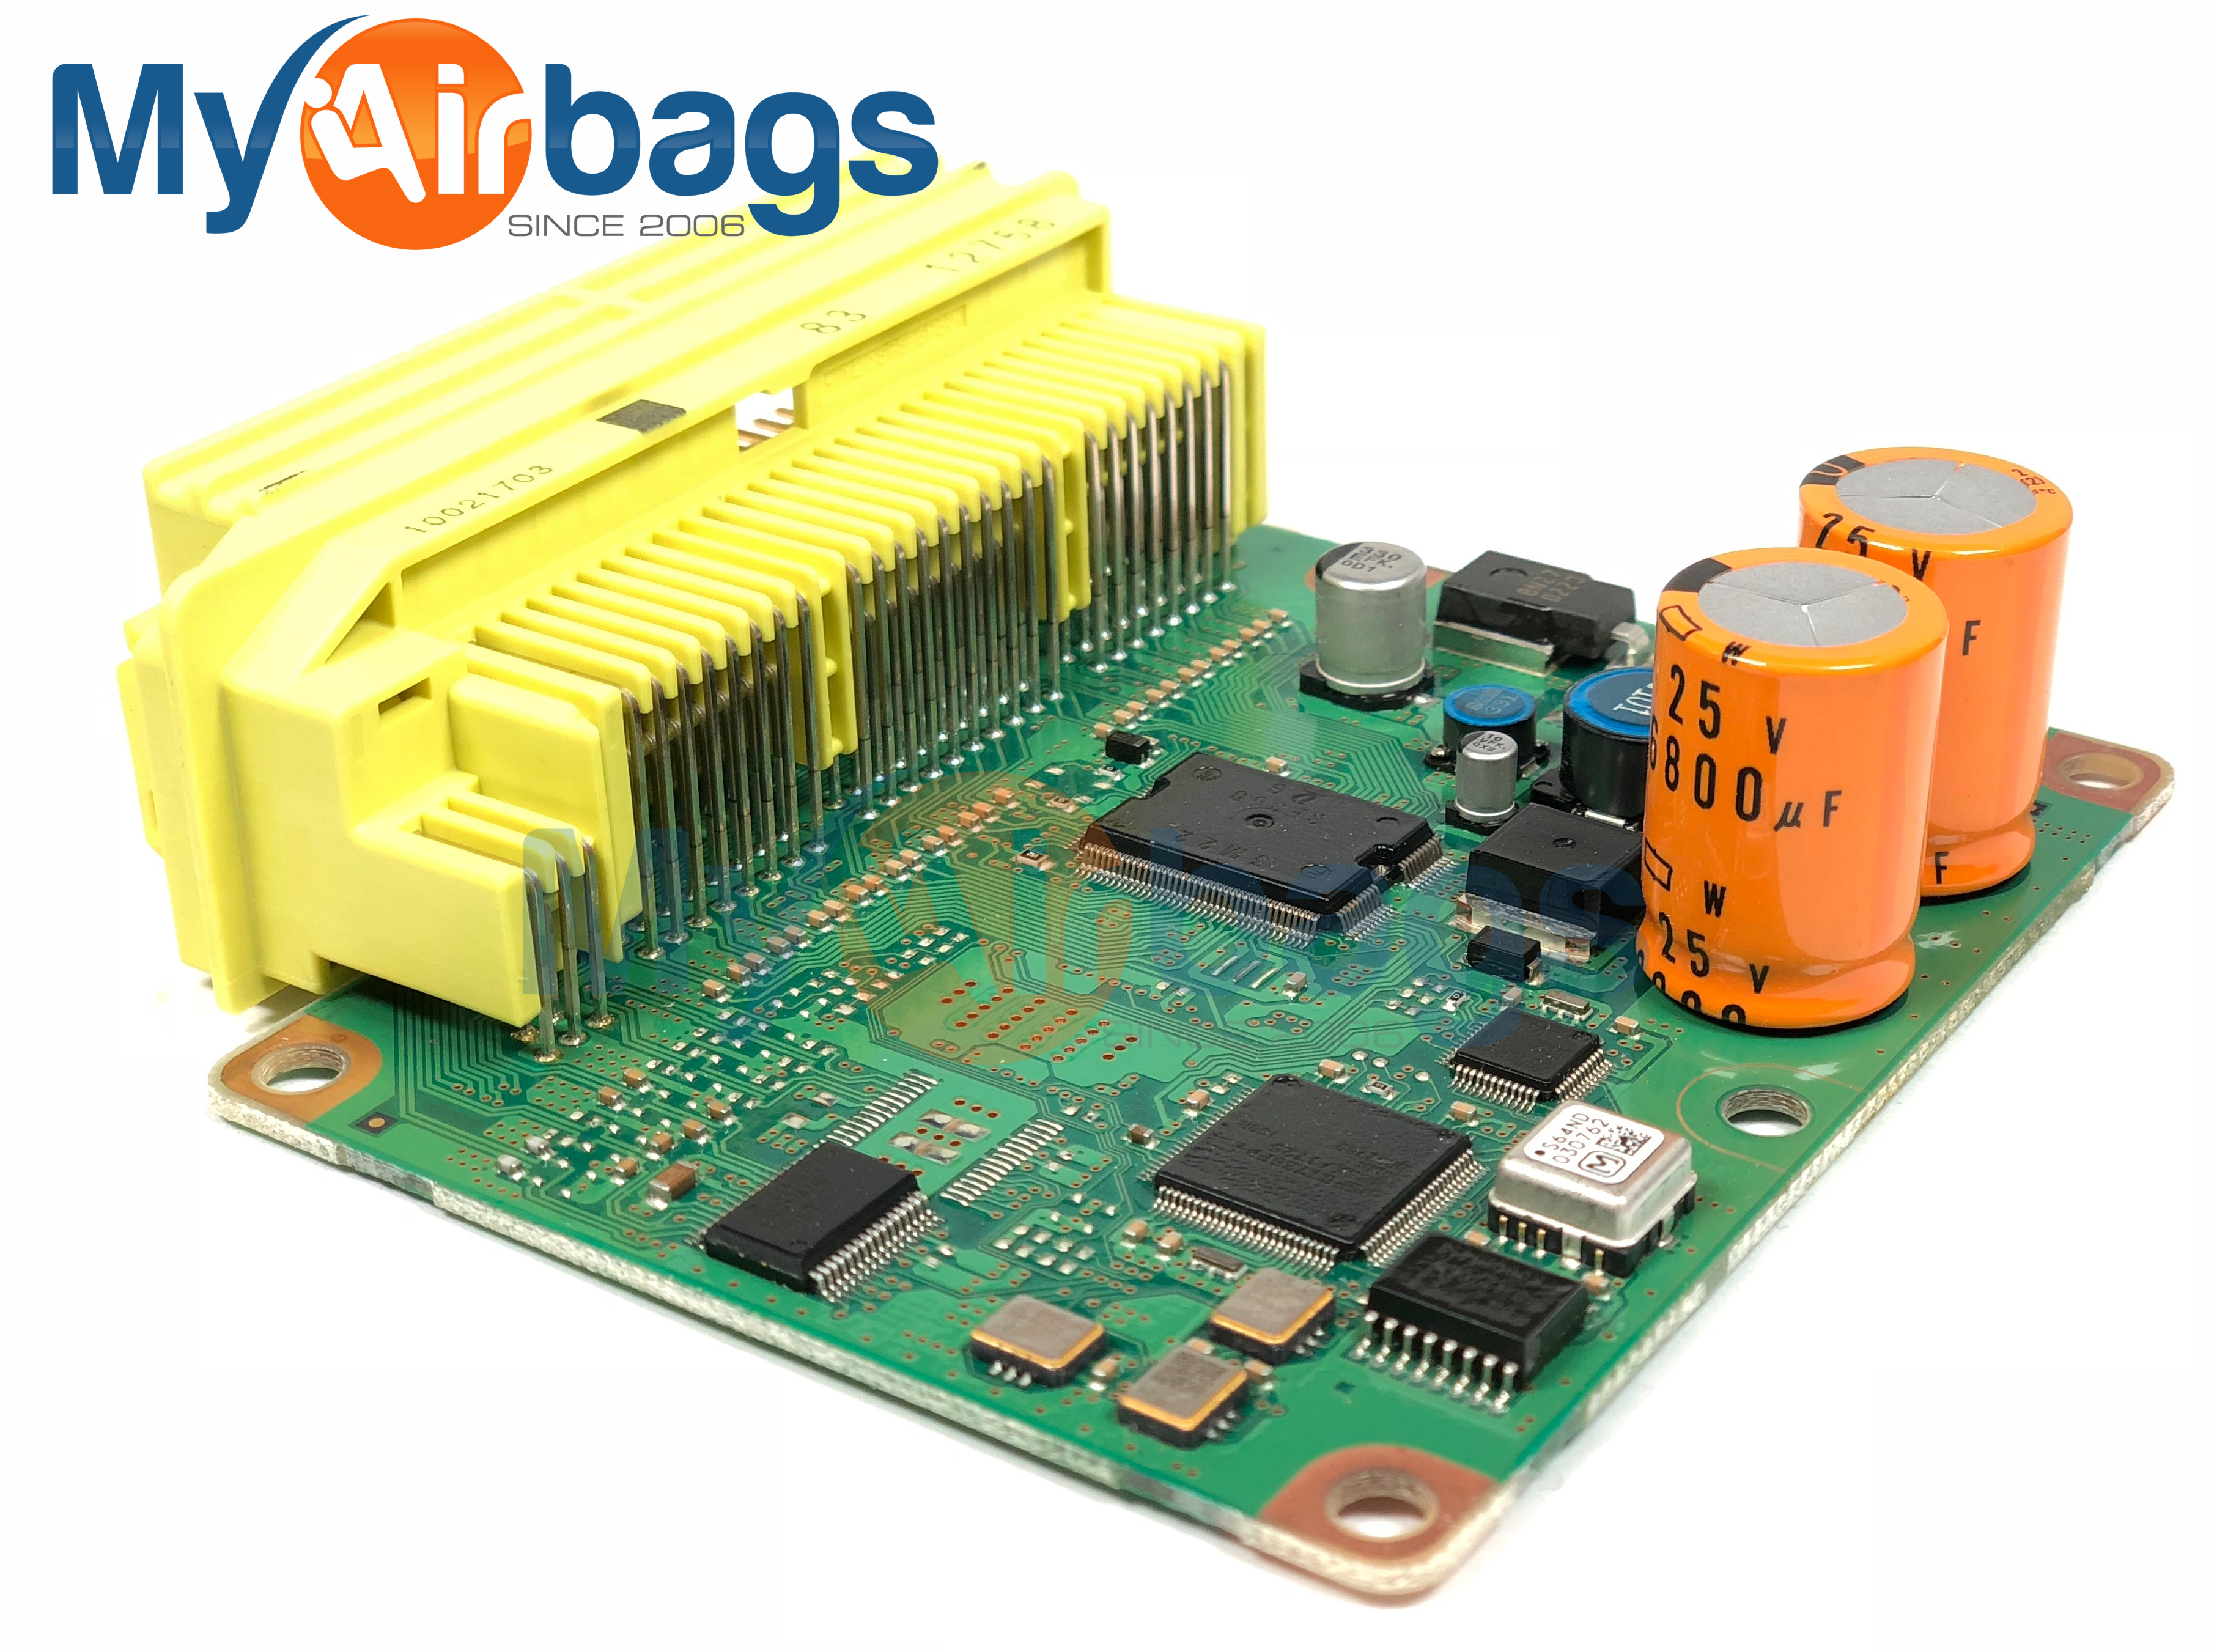 ACM-AIRBAG MODULE-SRS-PCB-CIRCUIT-BOARD-RCM-SAS-Myairbags